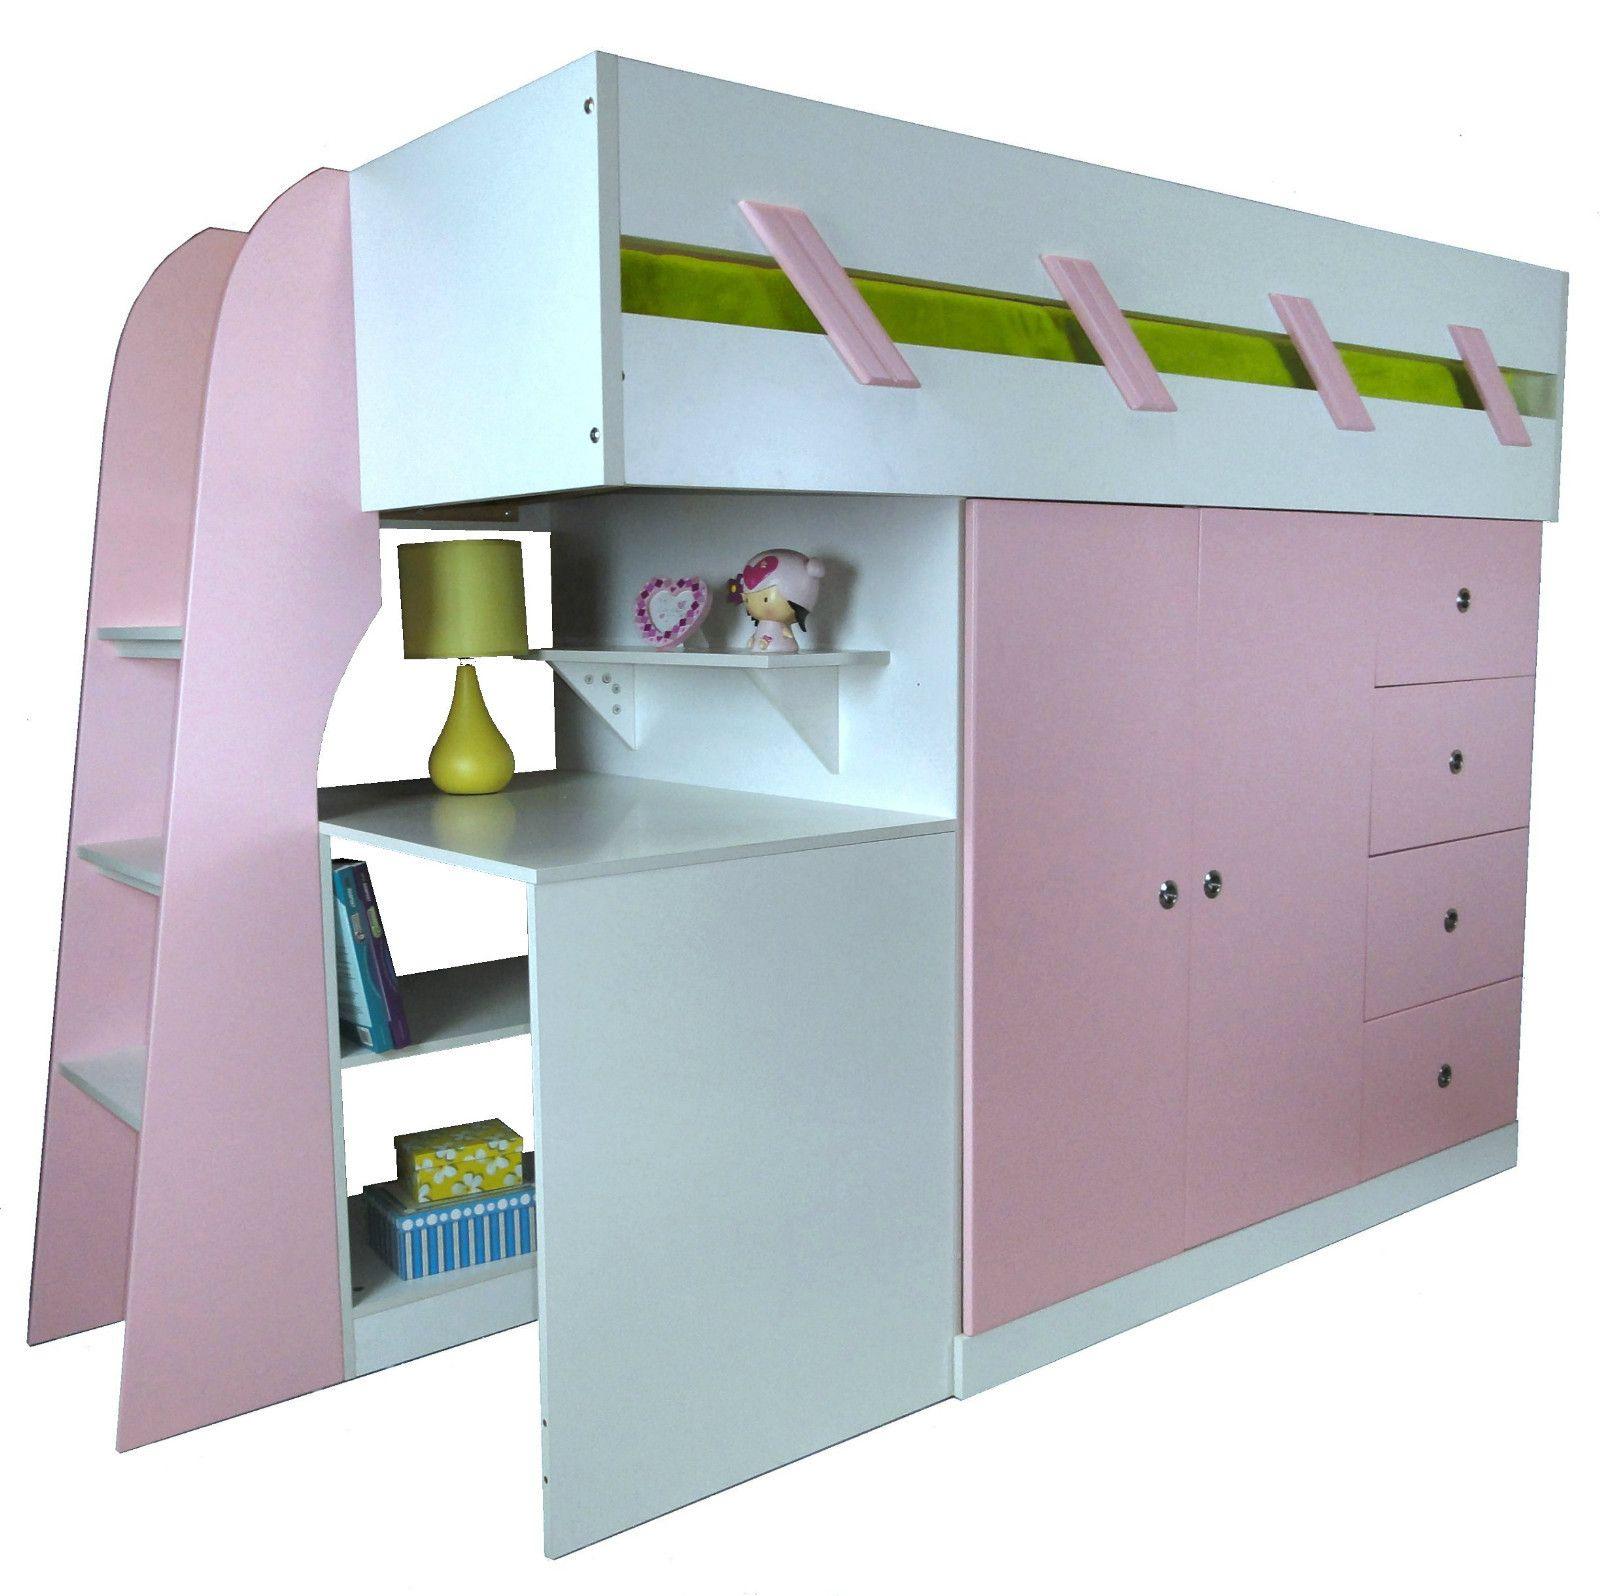 Loft bunk bed with desk  SINGLE LOFT CABIN BUNK BED WARDROBE DESKBOOKCASEMattress Kids